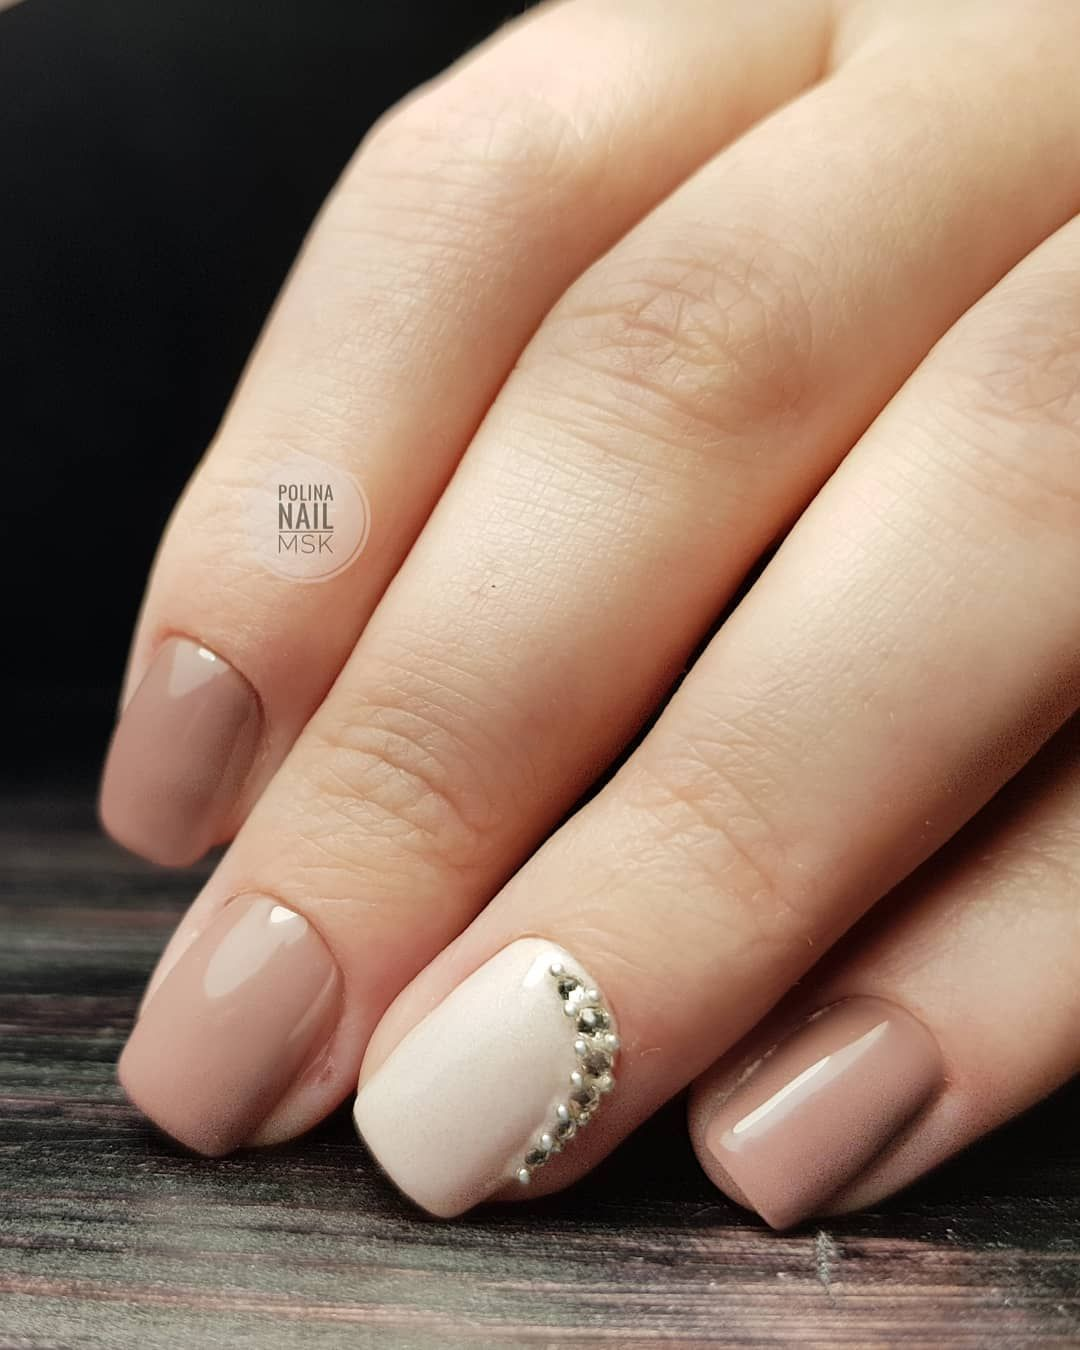 Нежный маникюр на ногтях фото 2018 новинки